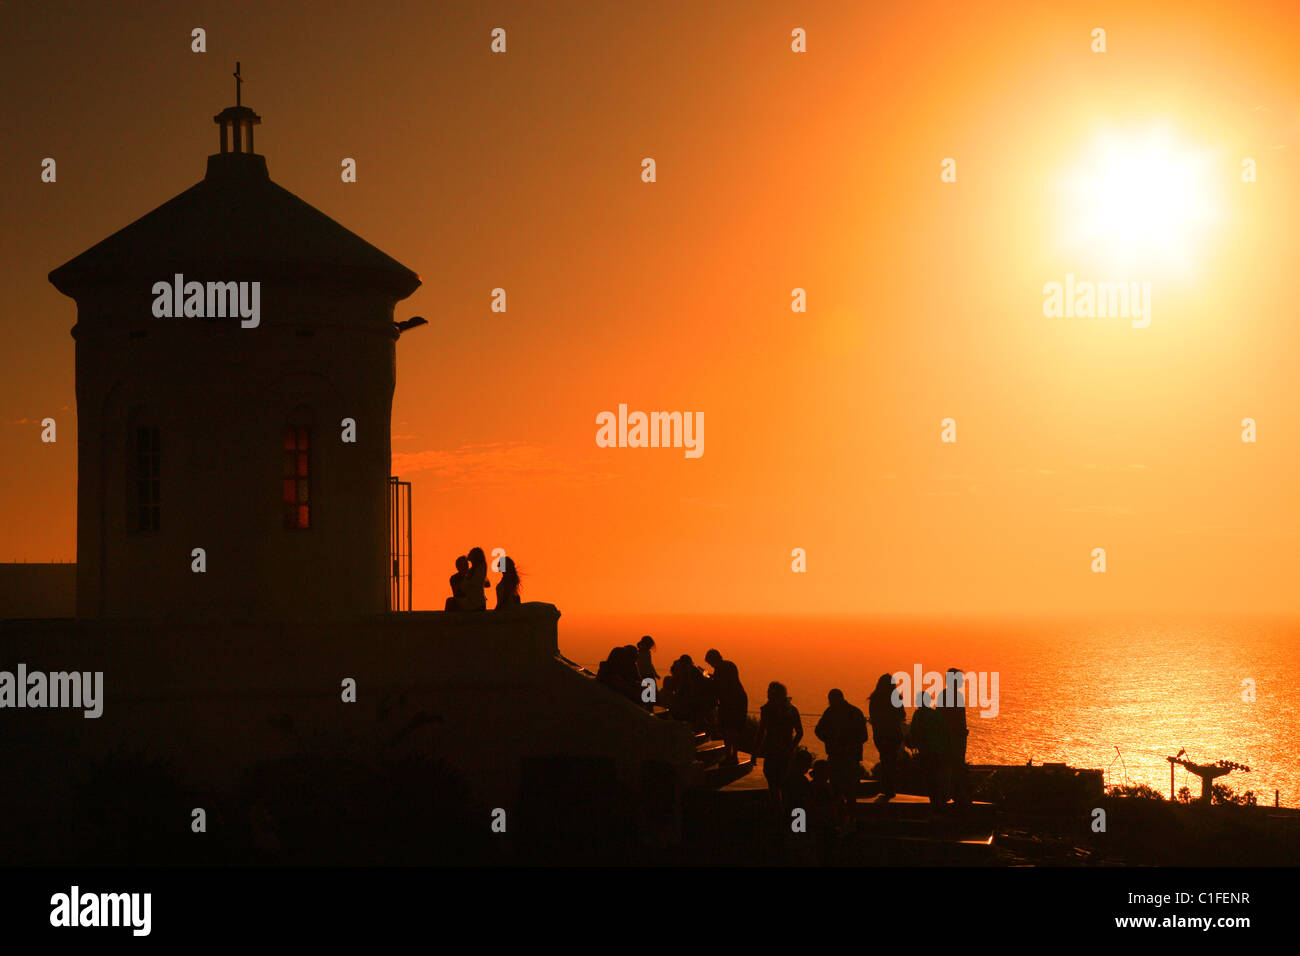 Small Church at cerro San Antonio top, in Piriapolis, during sunset. Maldonado, Uruguay, south america - Stock Image